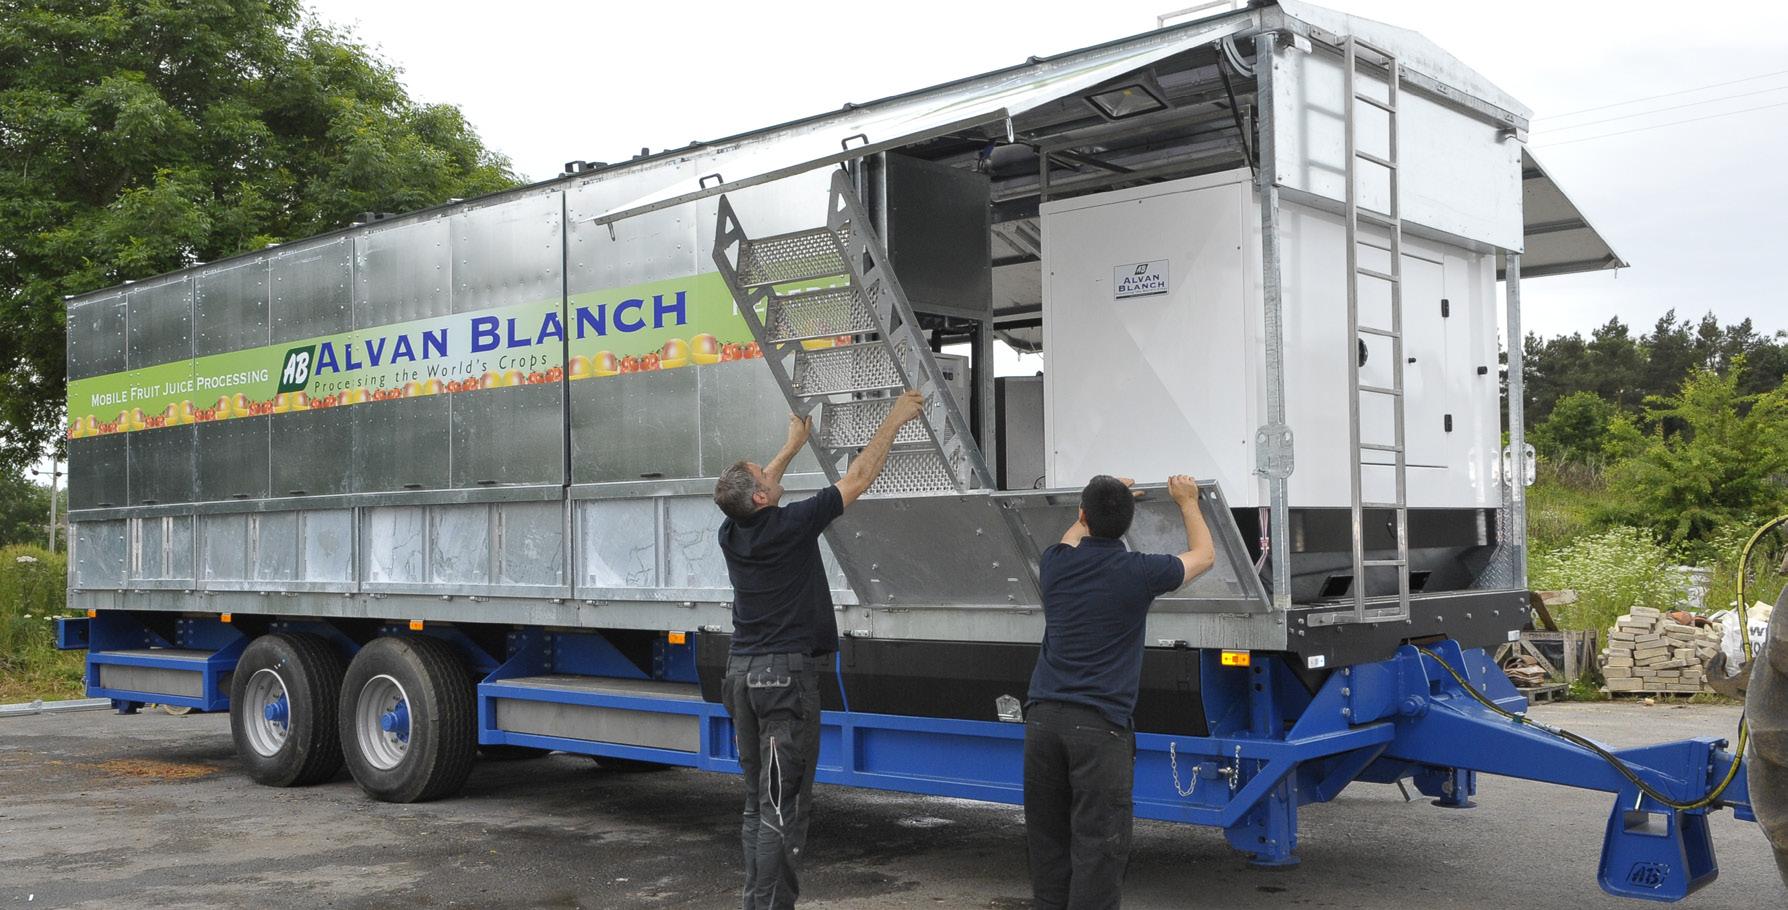 Alvan Blanch Mobile Fruit Juice Processing System Nigeria Page 5 Image 0001